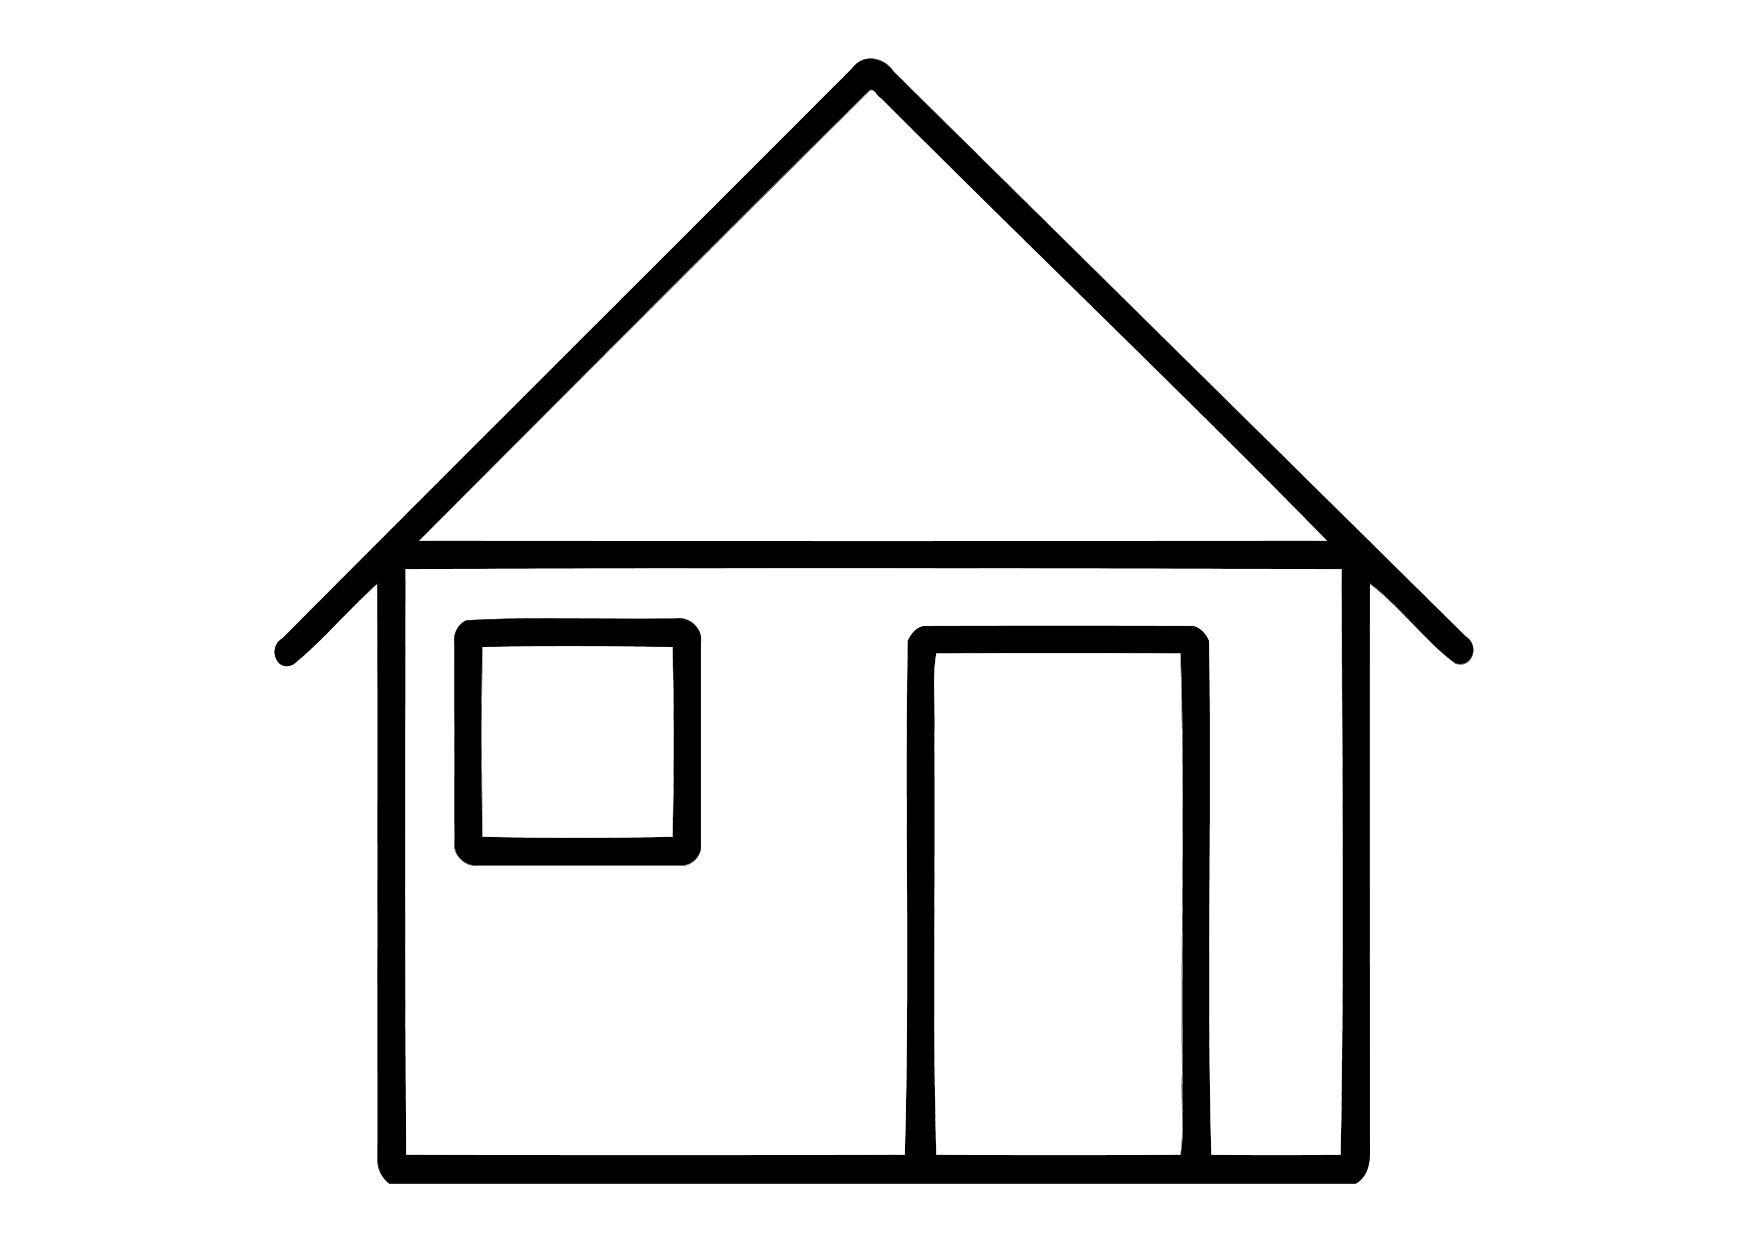 Dibujo para colorear casa img 11324 - Imagenes de casas para dibujar ...